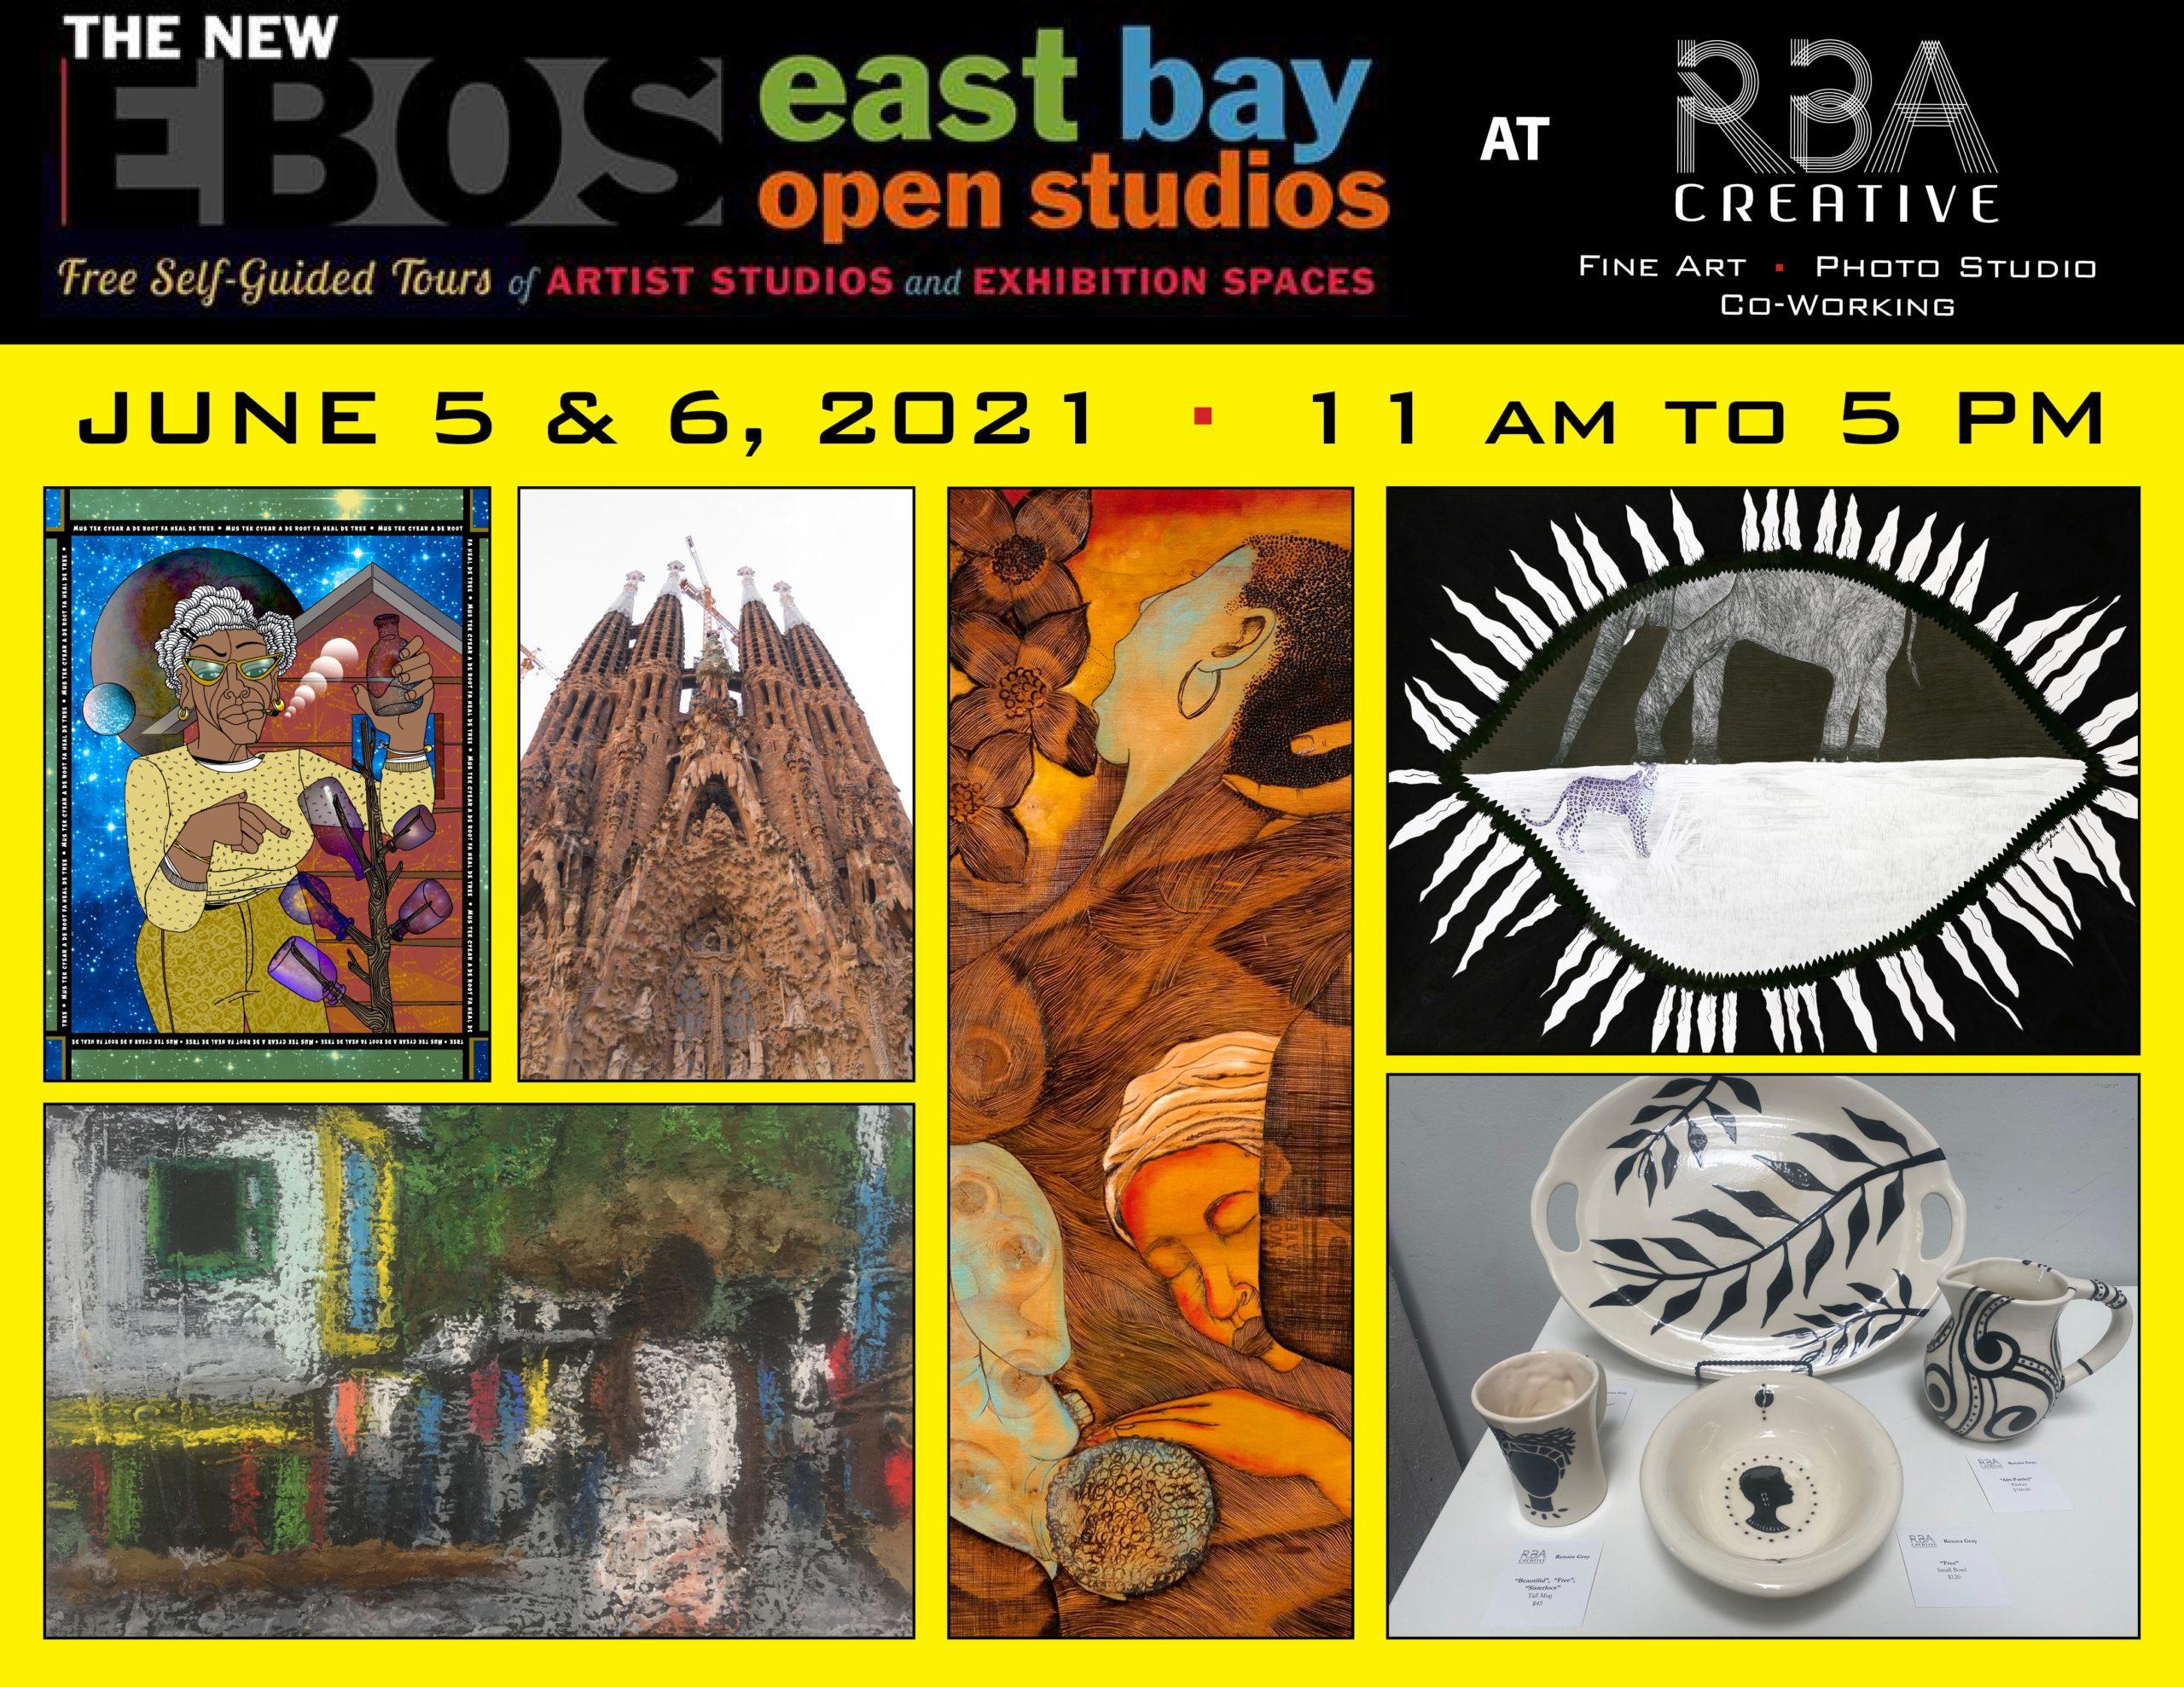 East Bay Open Studios 2021 at RBA Creative